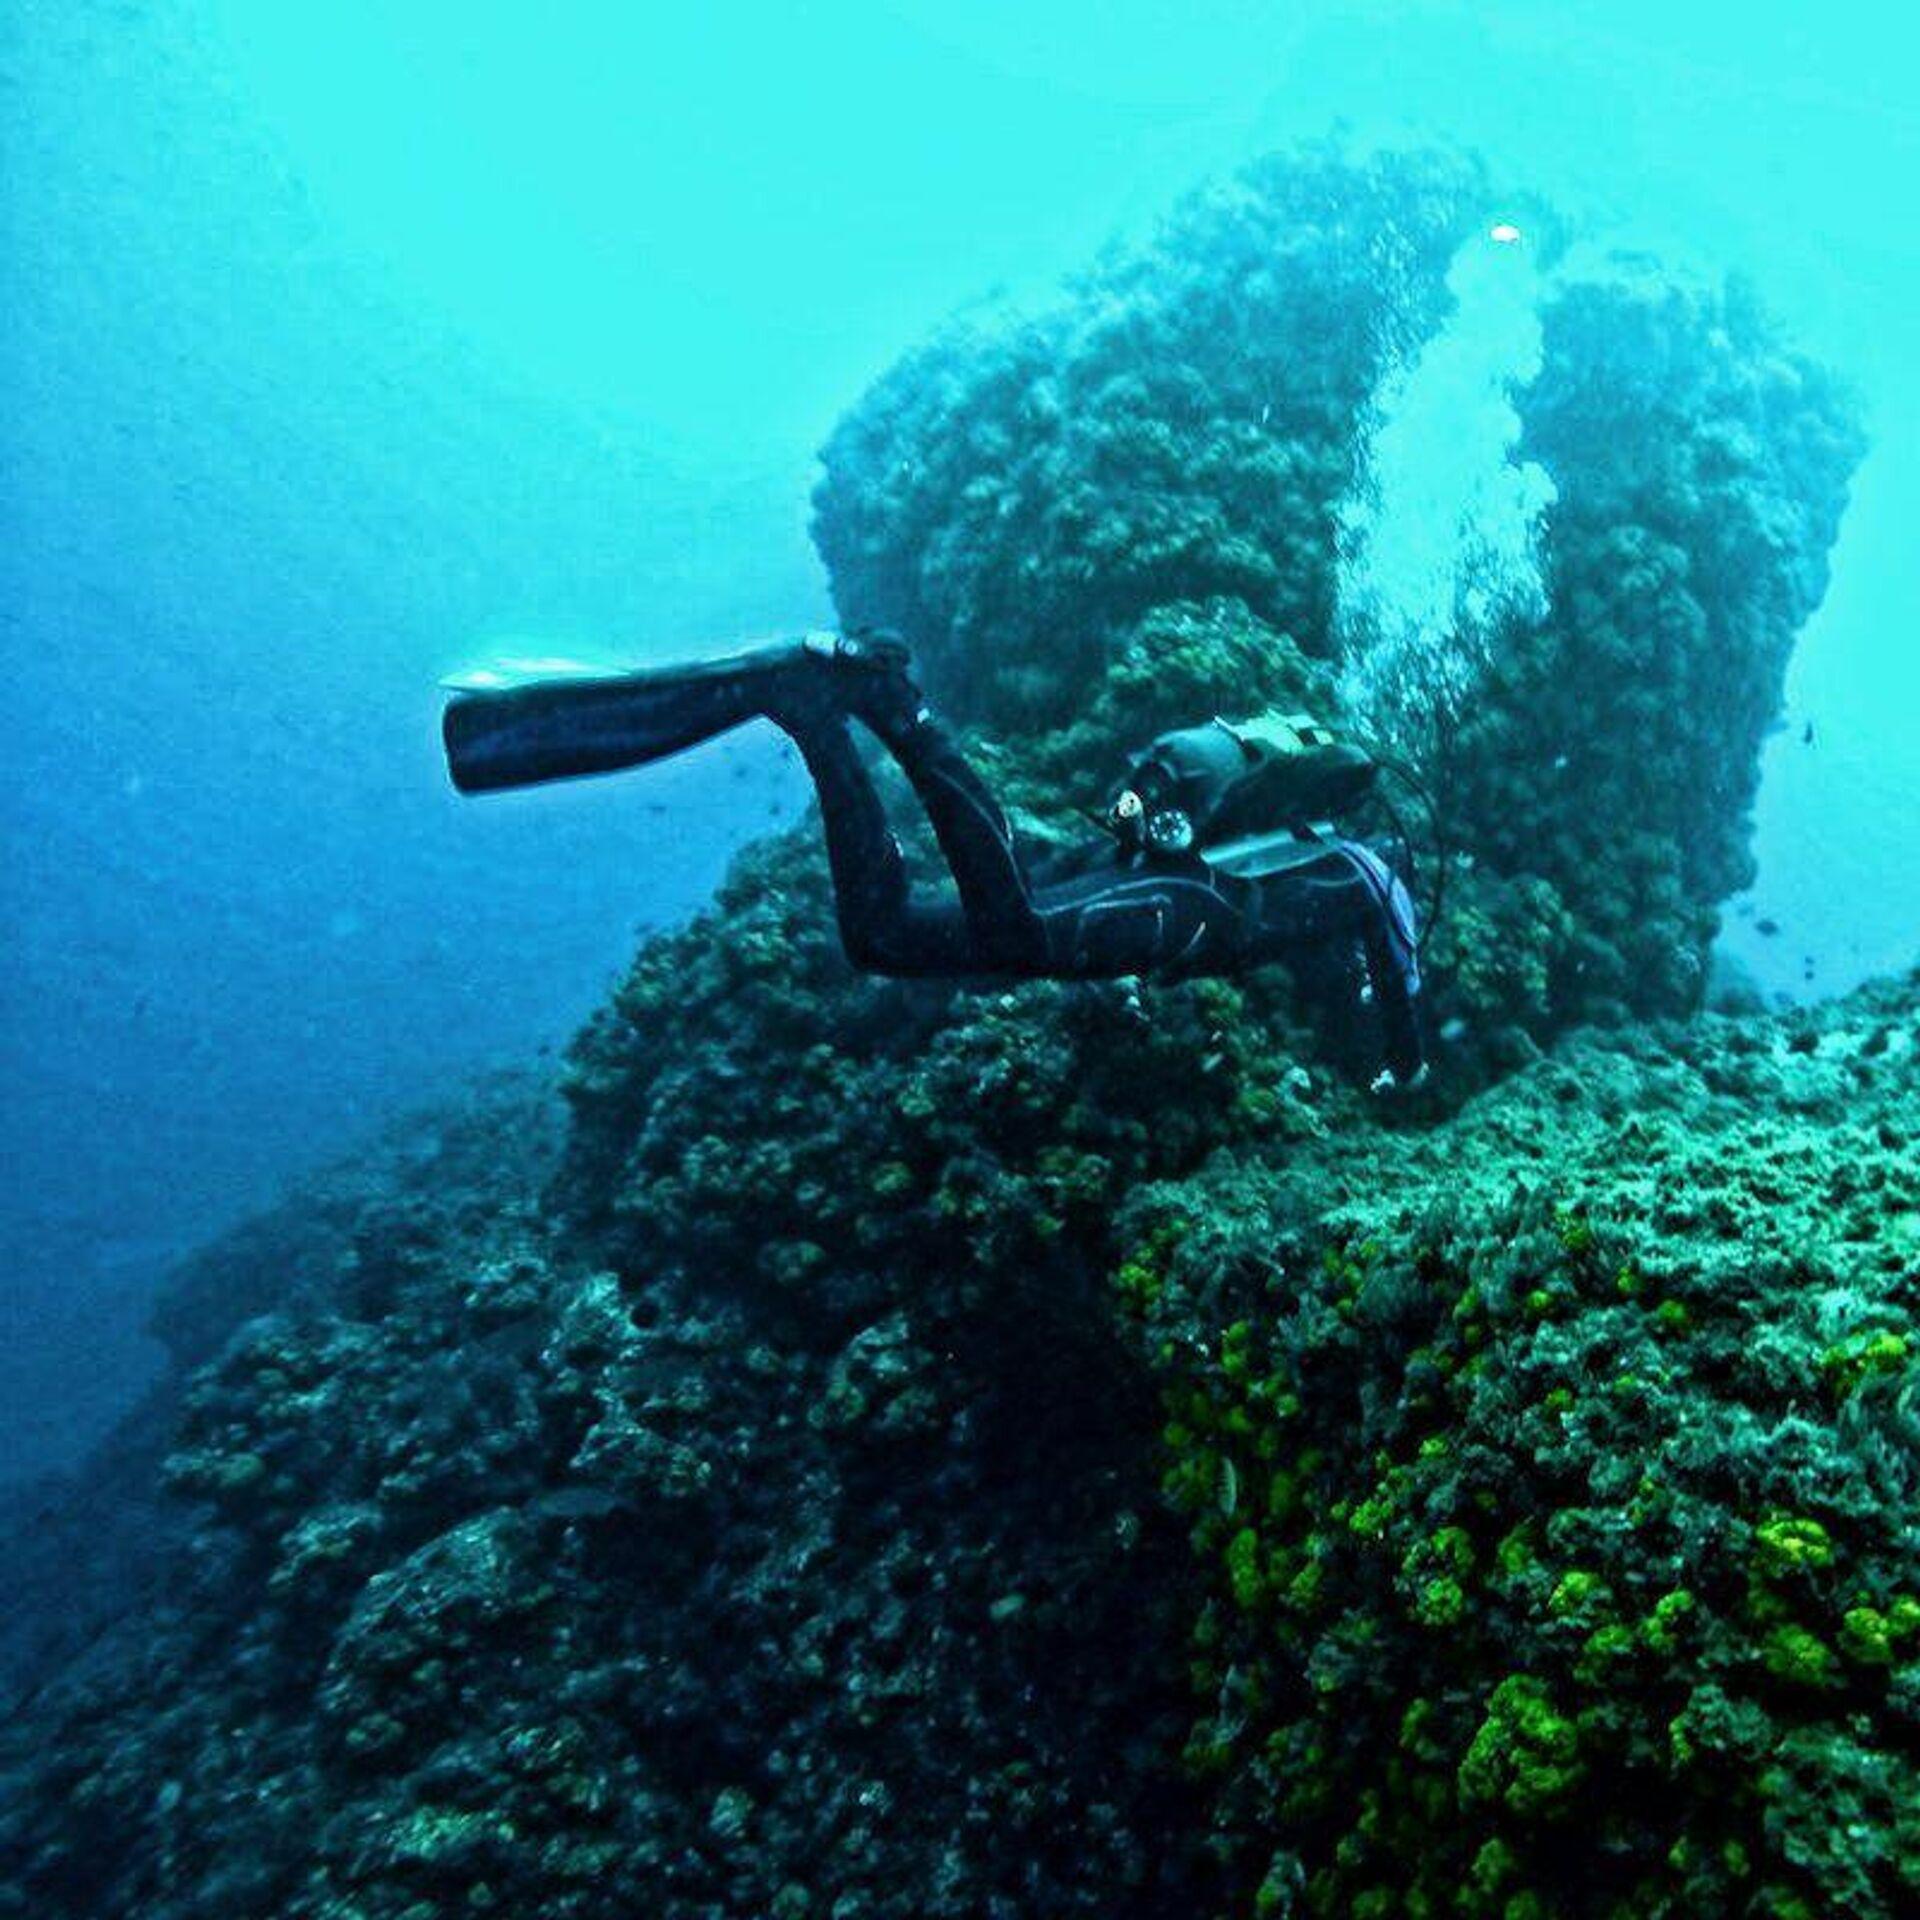 Fran Kucker buceando con algas en las costas de Maro–Cerro Gordo - Sputnik Mundo, 1920, 04.06.2021